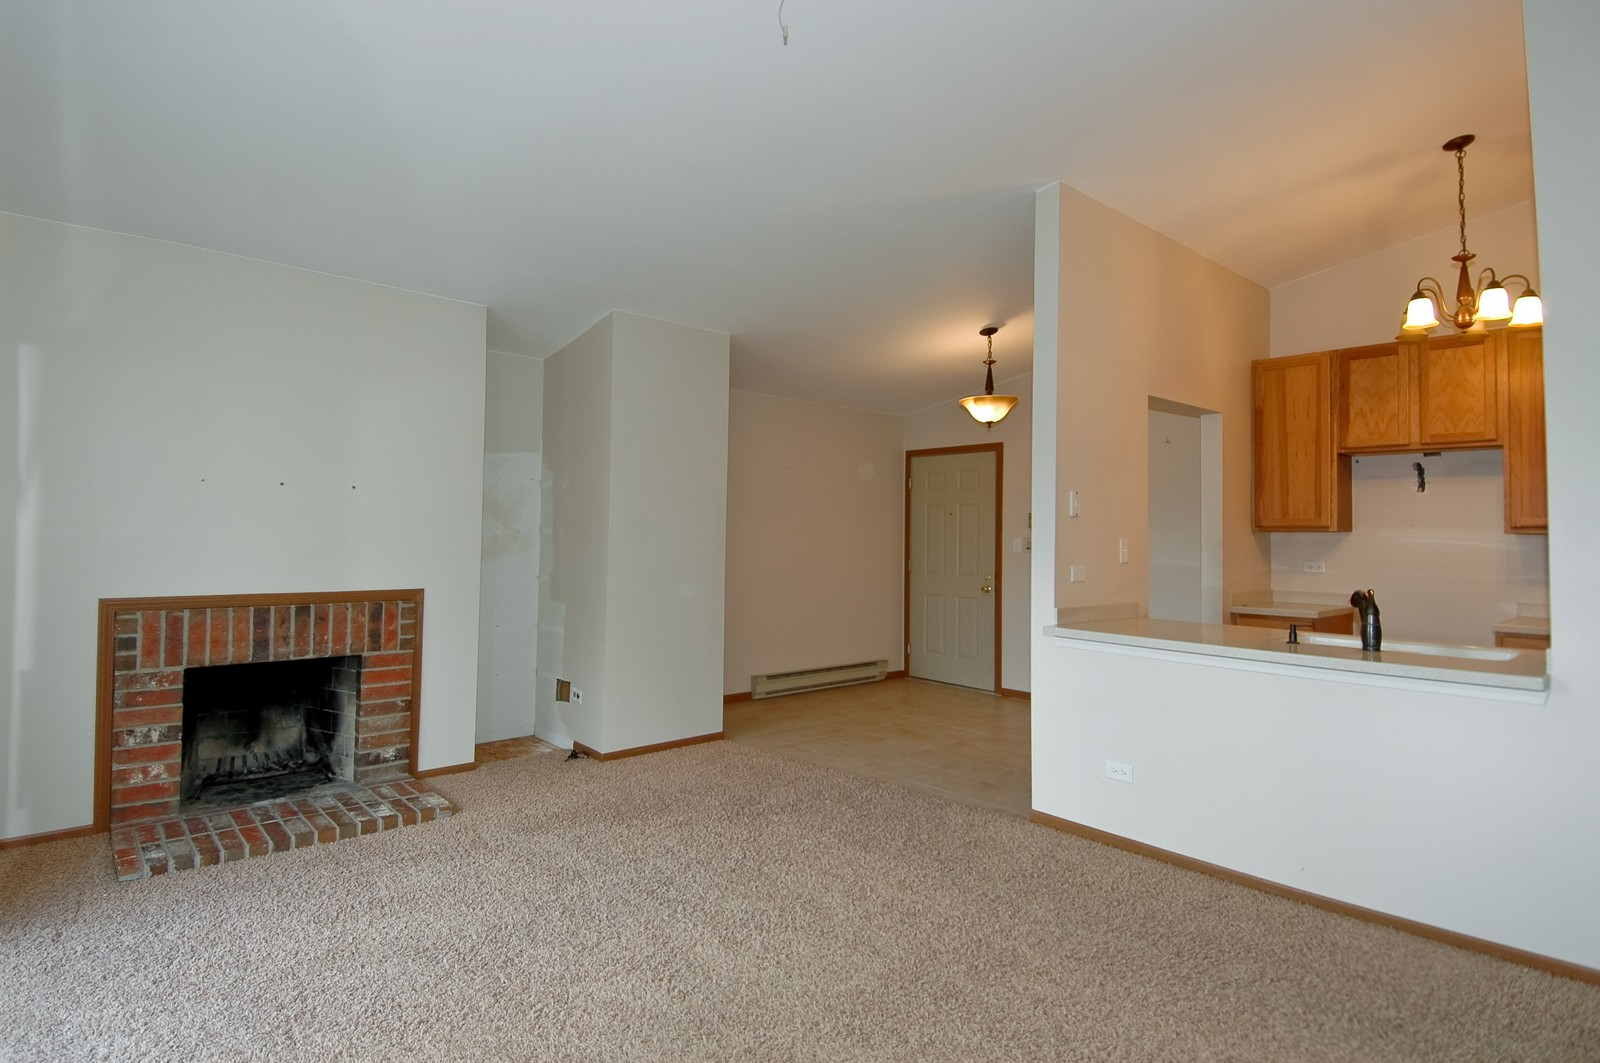 Real Estate Photography - 4314 Shamrock Ln, Unit 3B, McHenry, IL, 60050 - Kitchen / Living Room